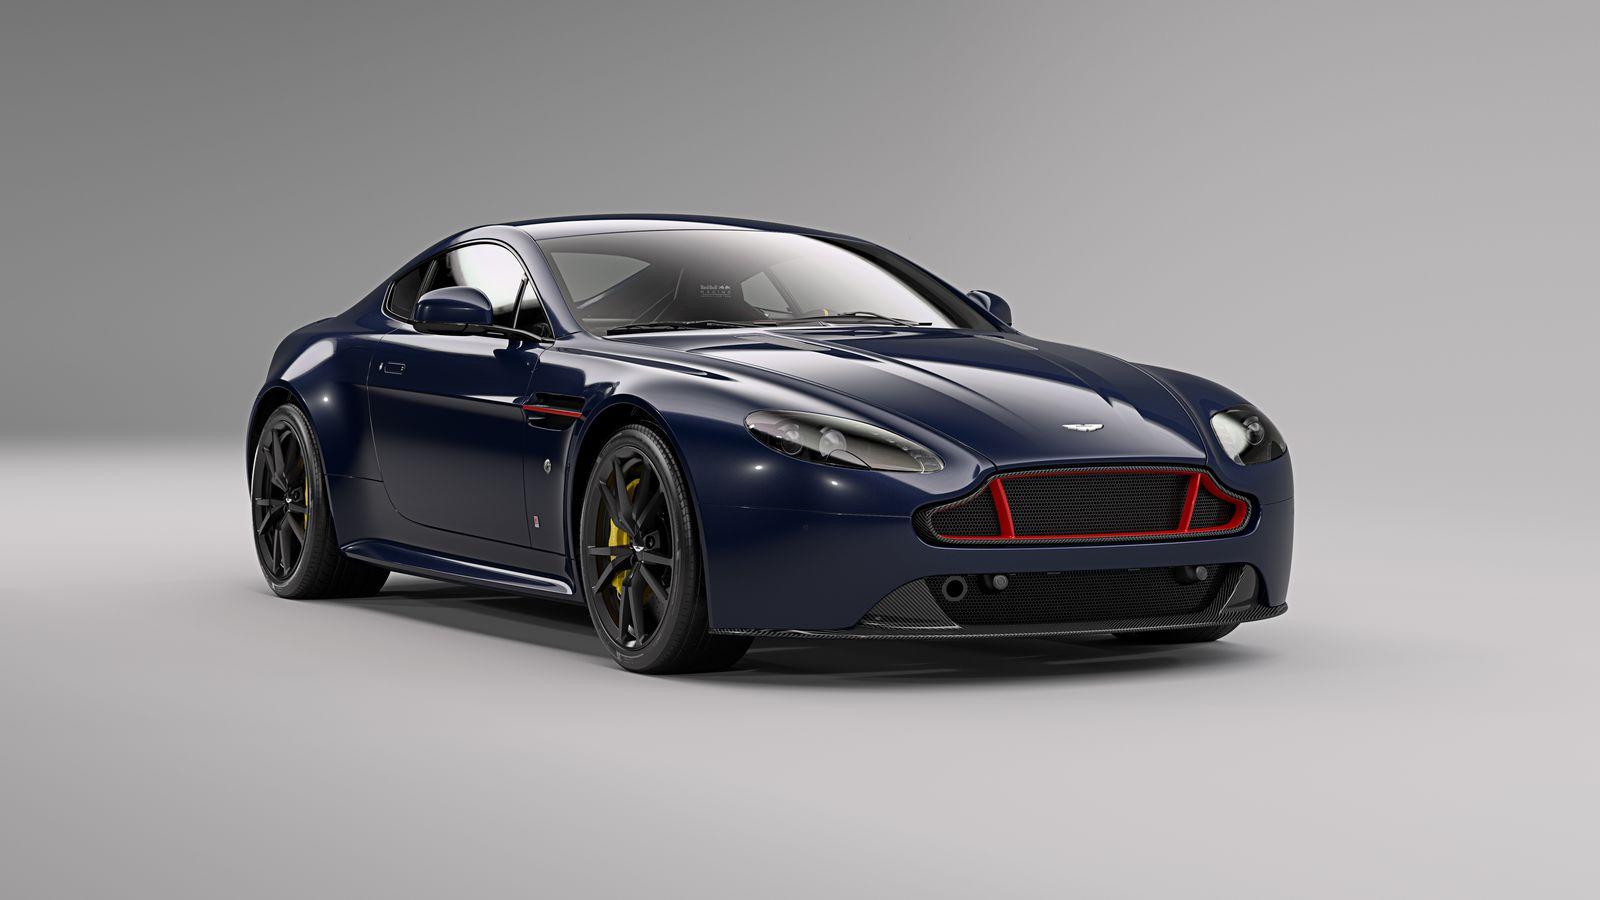 Aston Martin V8 and V12 Vantage Red Bull Racing Editions (1)